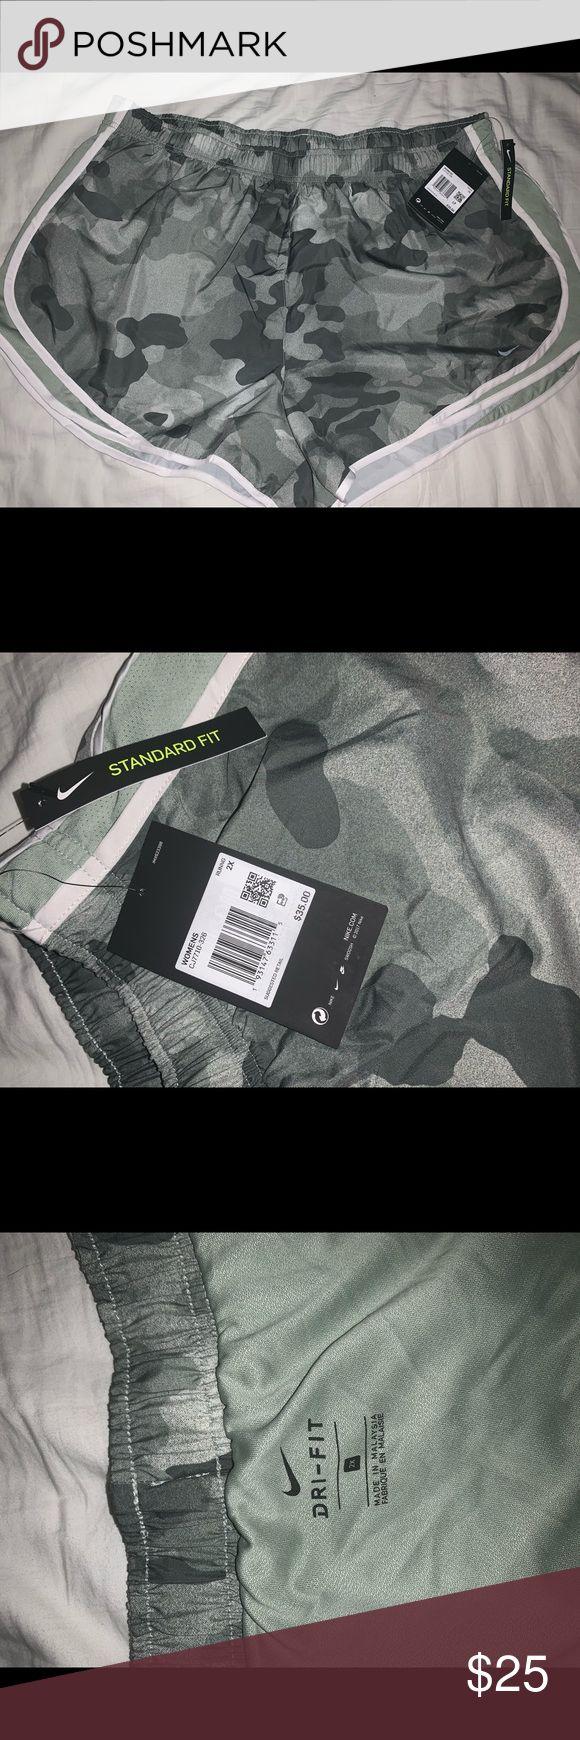 2x Camo Nike Shorts Brandneue Nike Camo Shorts. Größe 2x. Nie getragene, perfekte …   – My Posh Picks